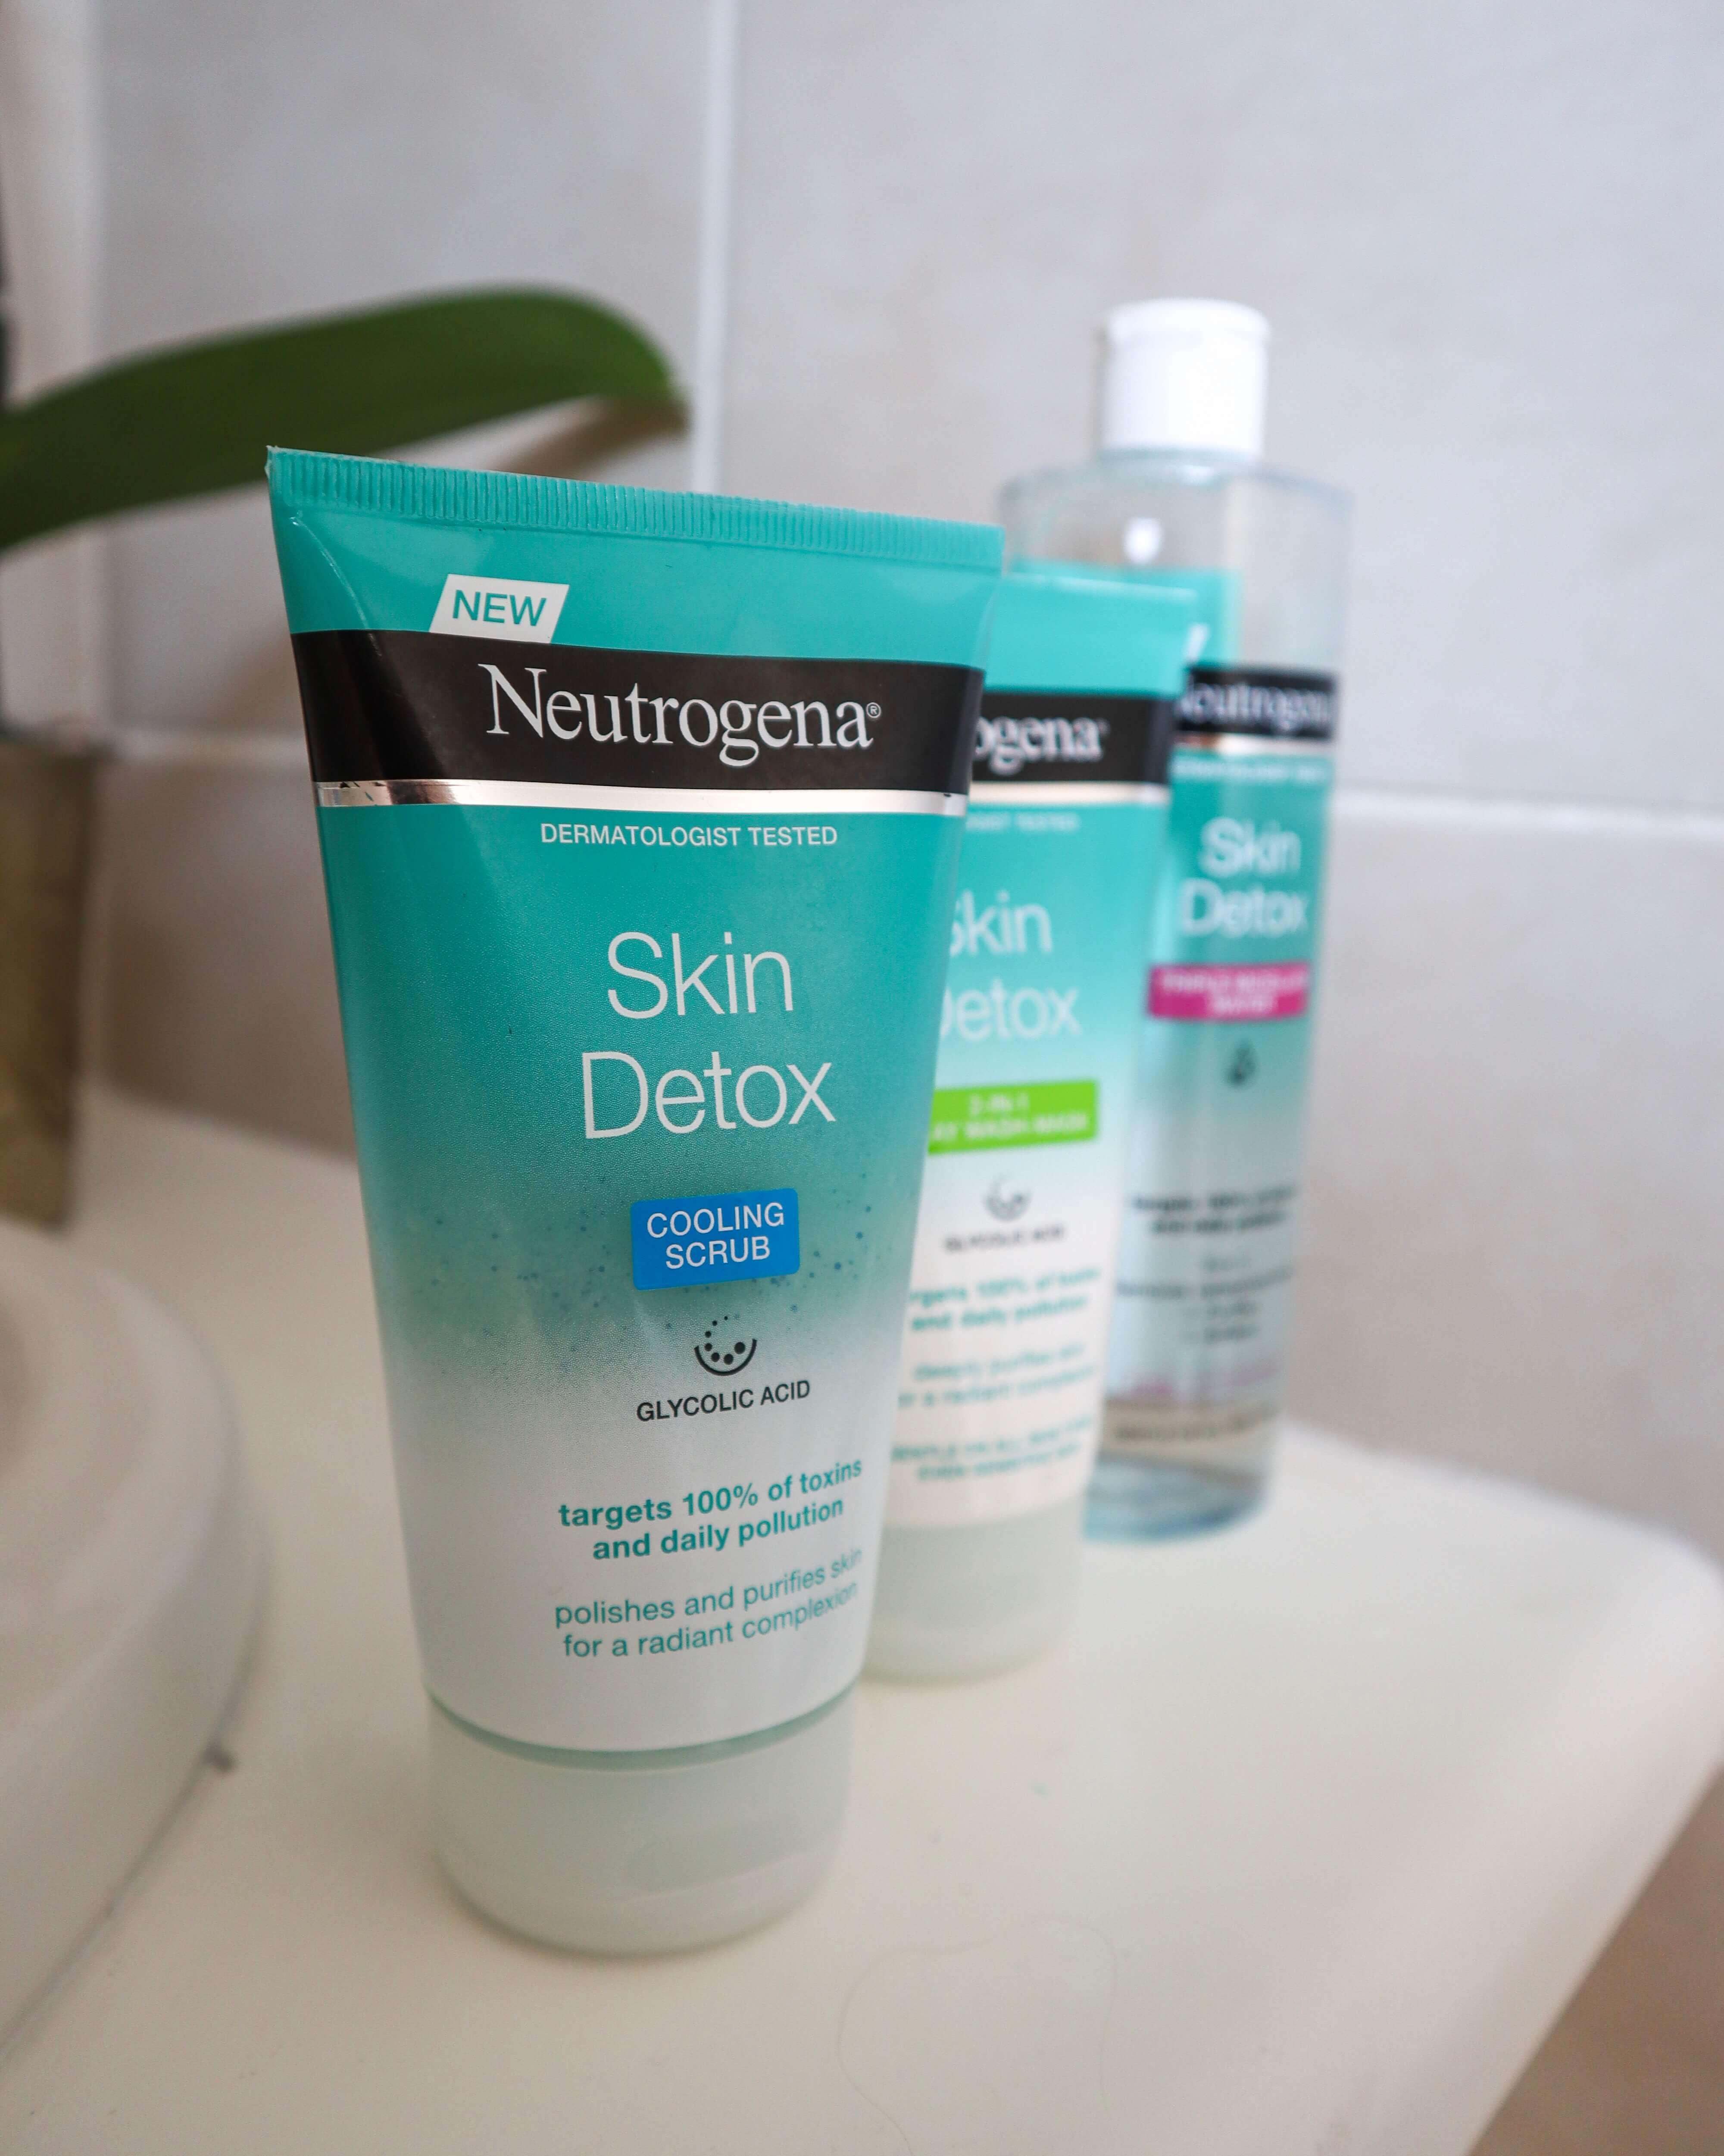 Neutrogena Skin Detox cooling scrub